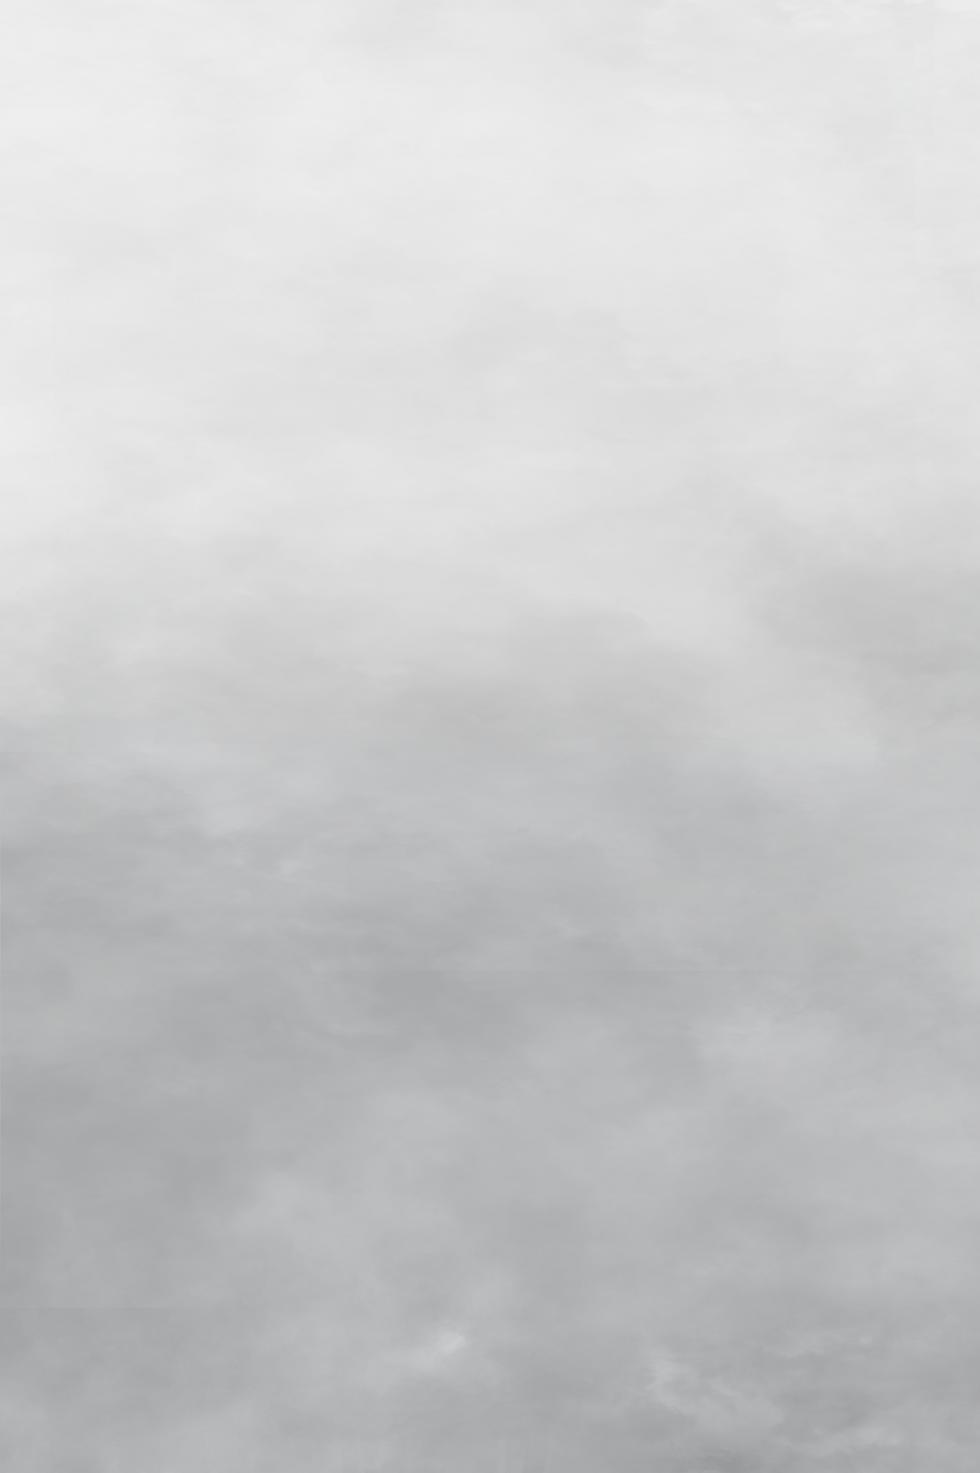 fog bg.png